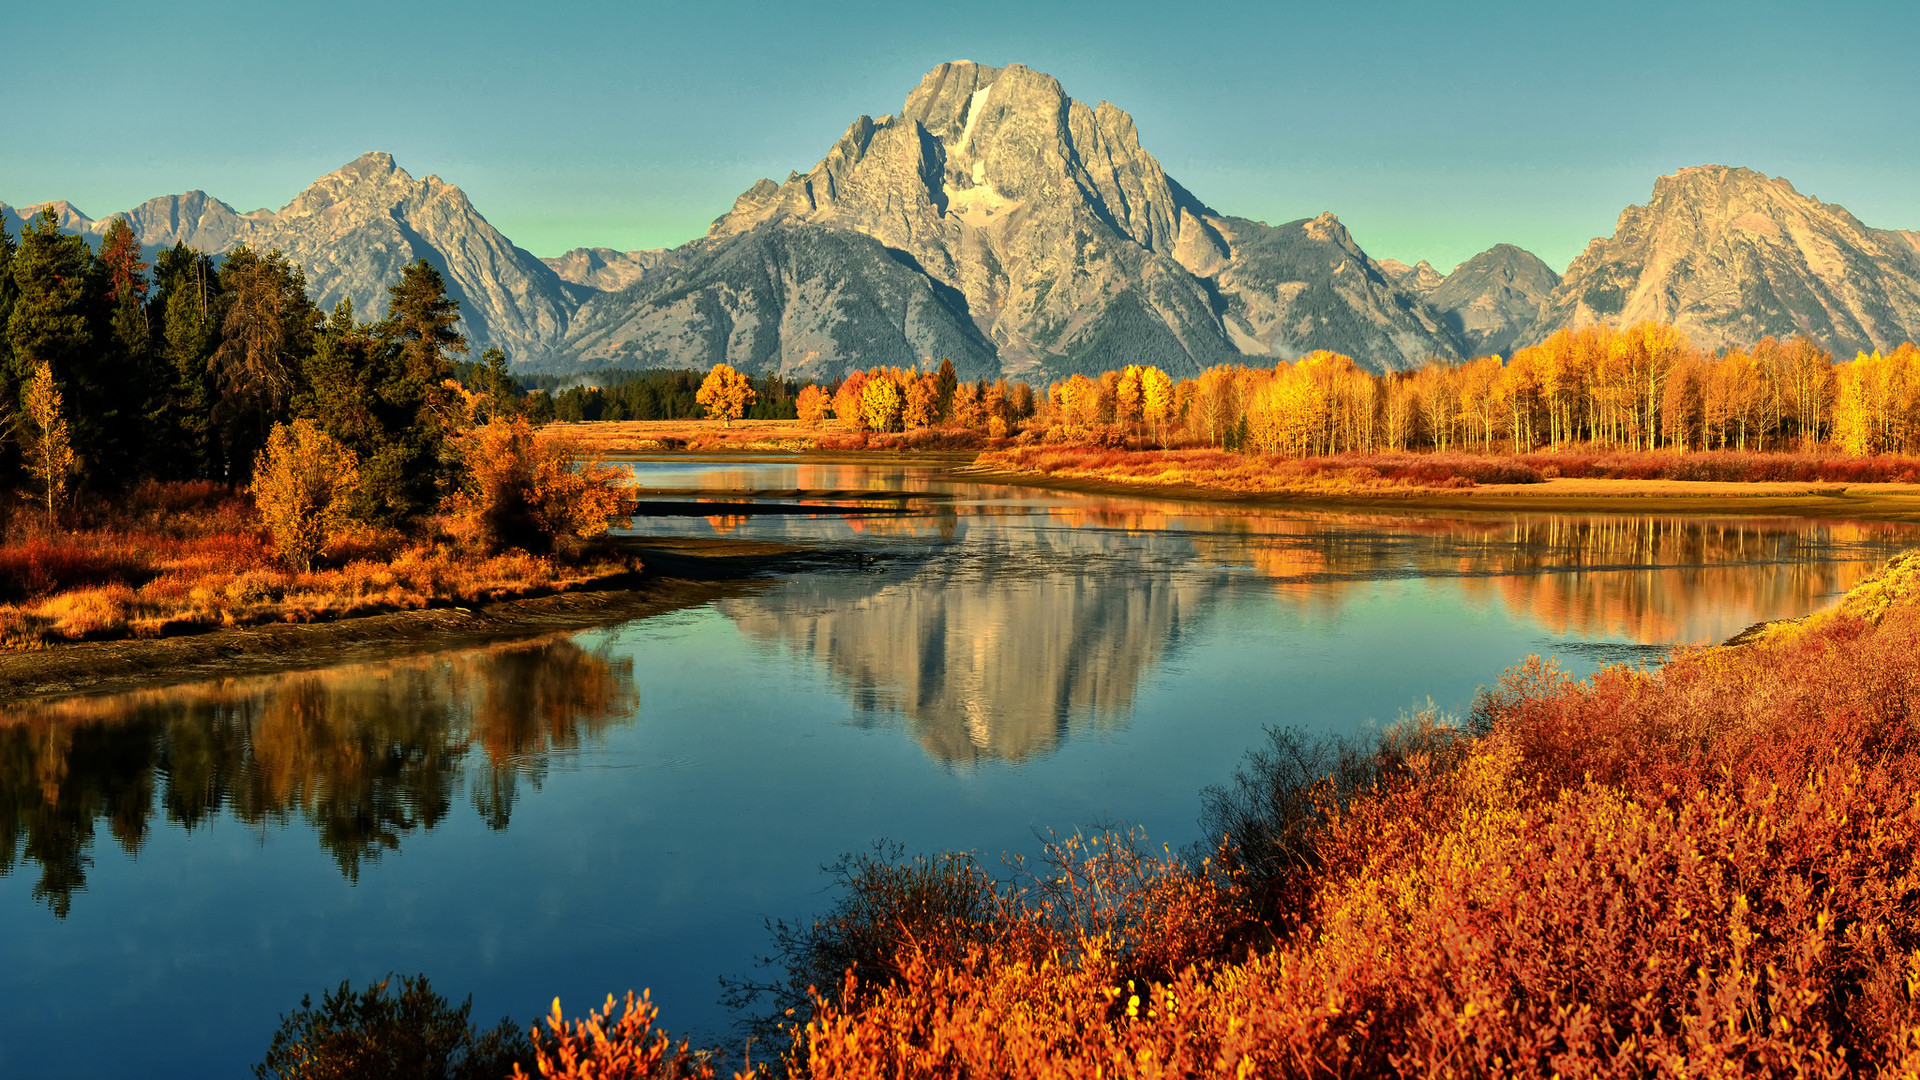 Golden Morning at the Bend by © Jeff R. Clow – Desktop Wallpaper